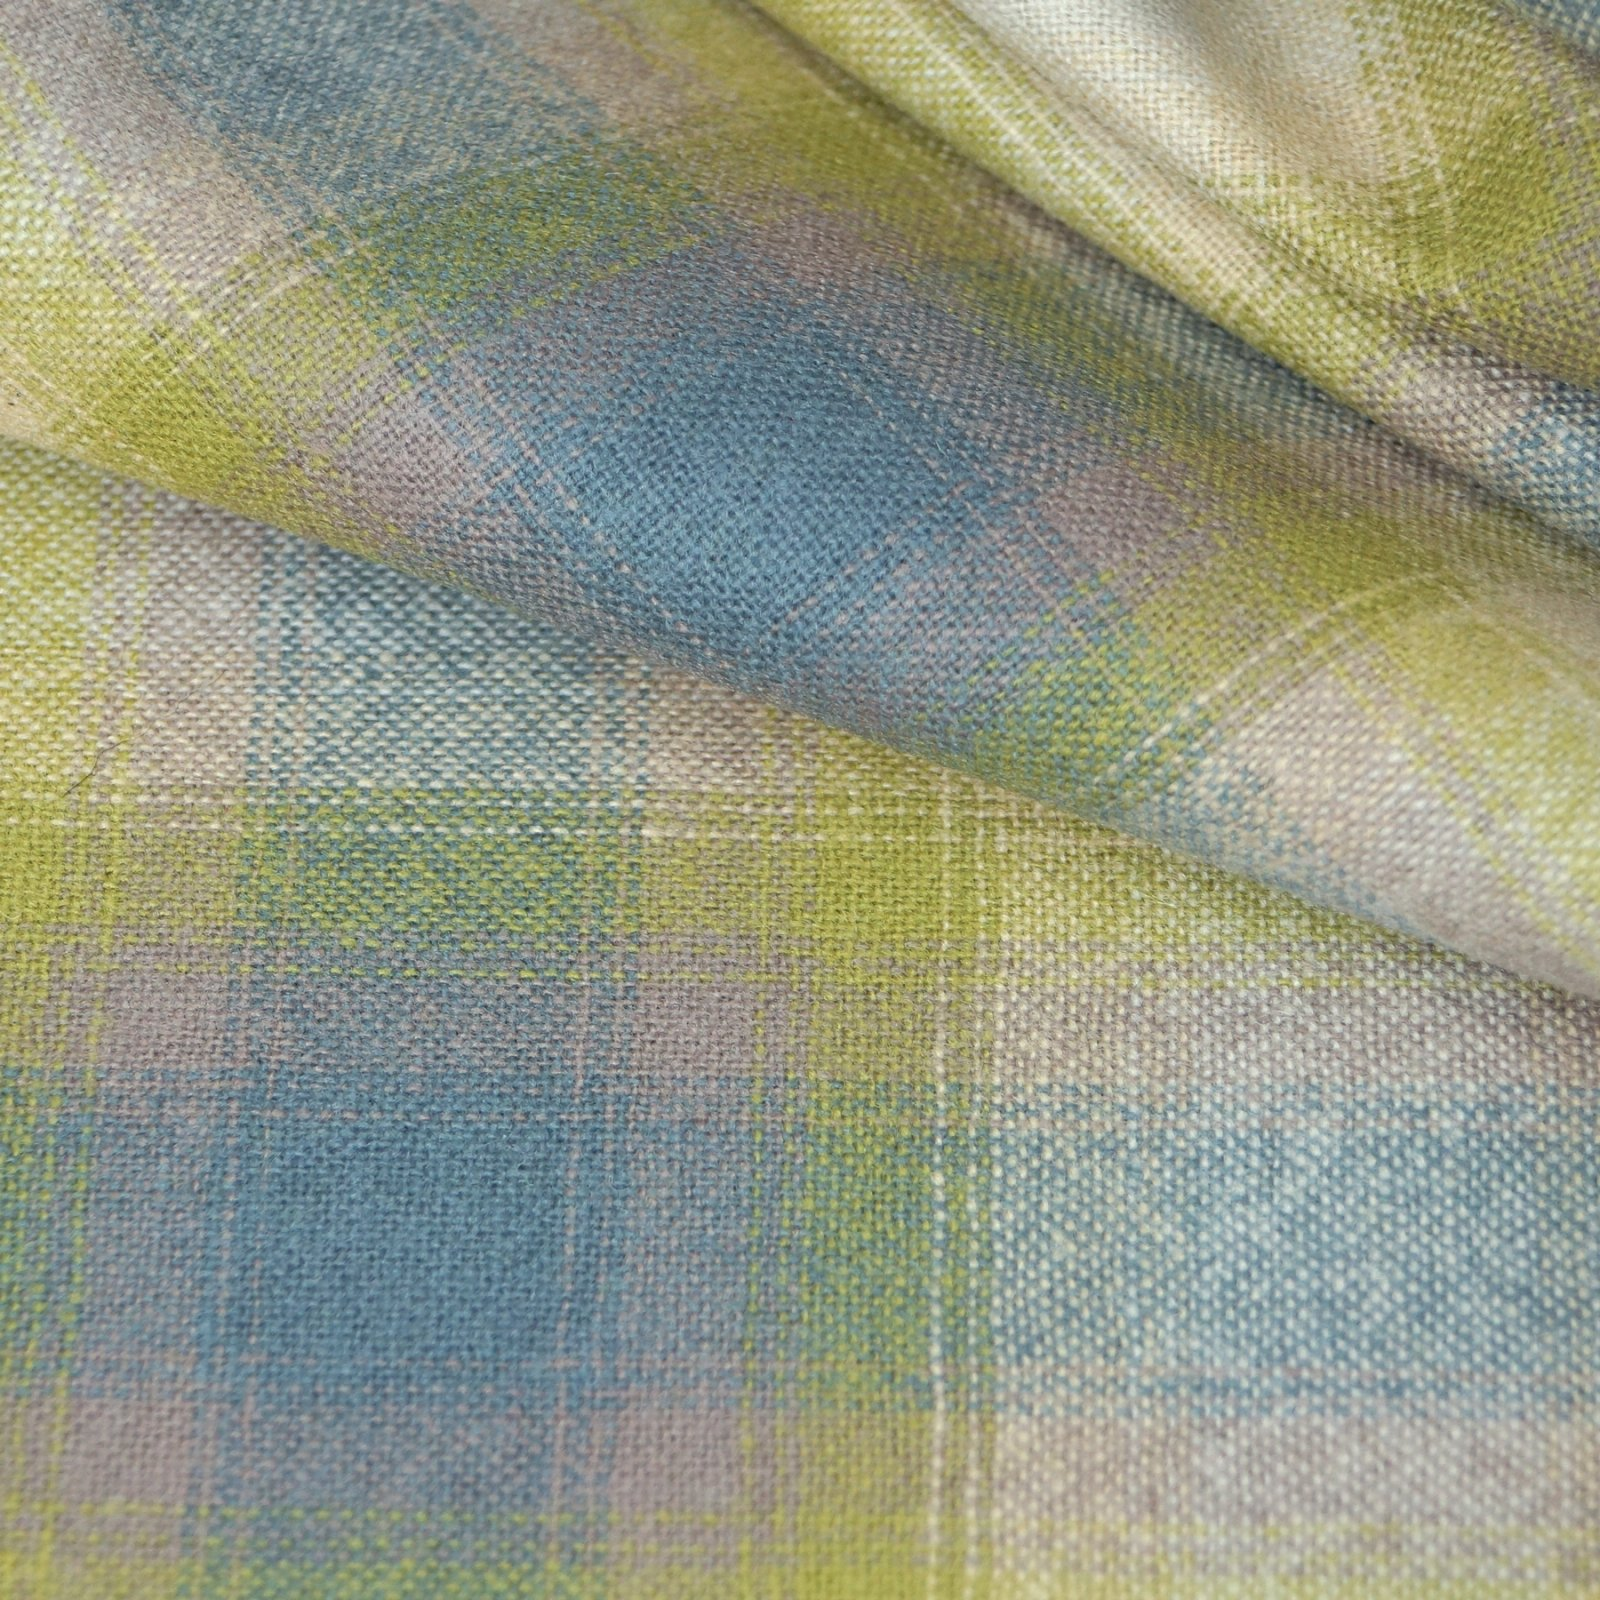 Wool - Pendleton (TM) Cream, Blue, Lavender, and Green